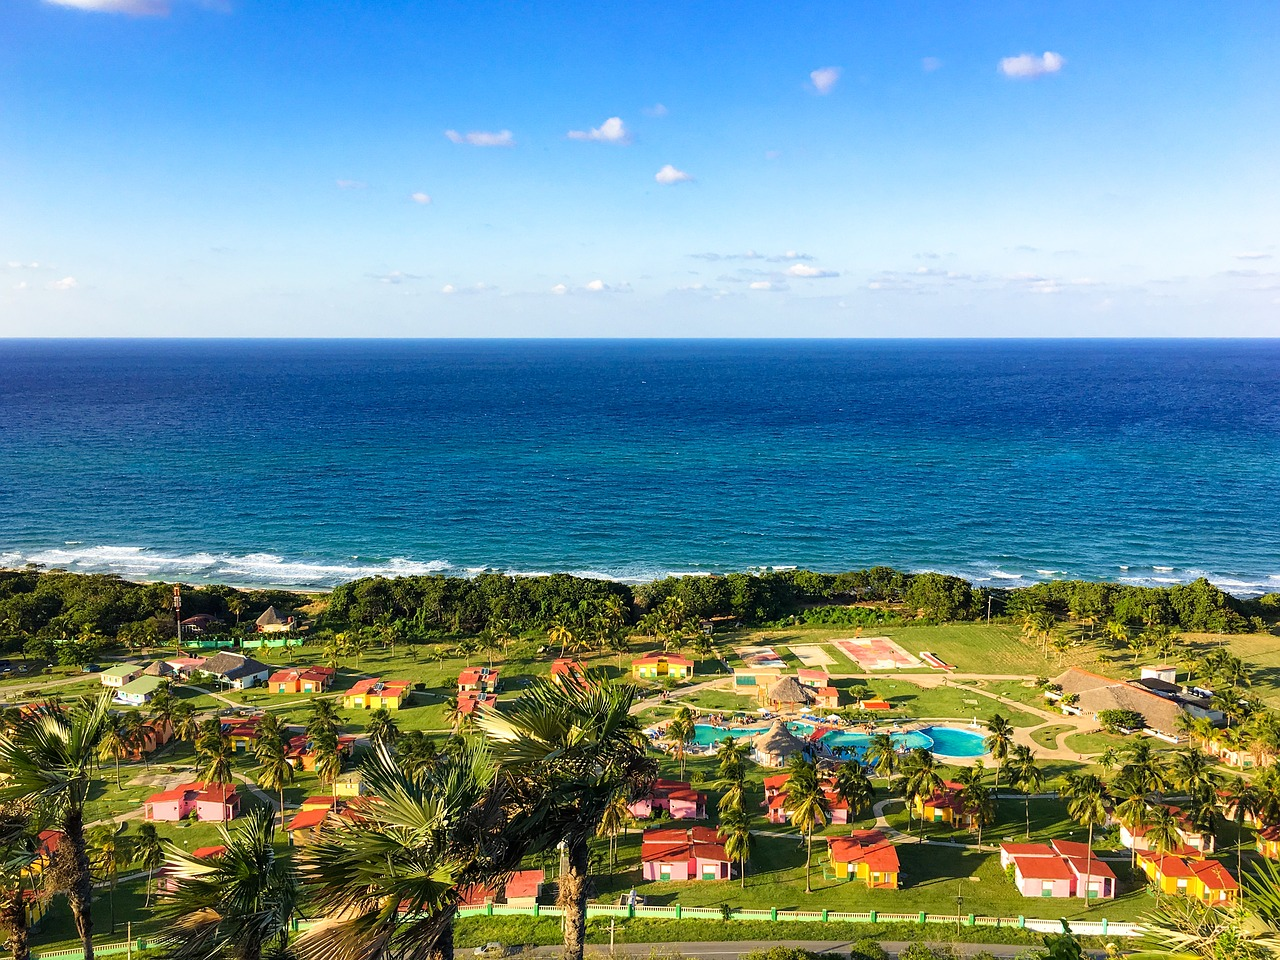 Kuba All Inclusive Urlaub eine Woche ab 679,00€ - Varadero 1